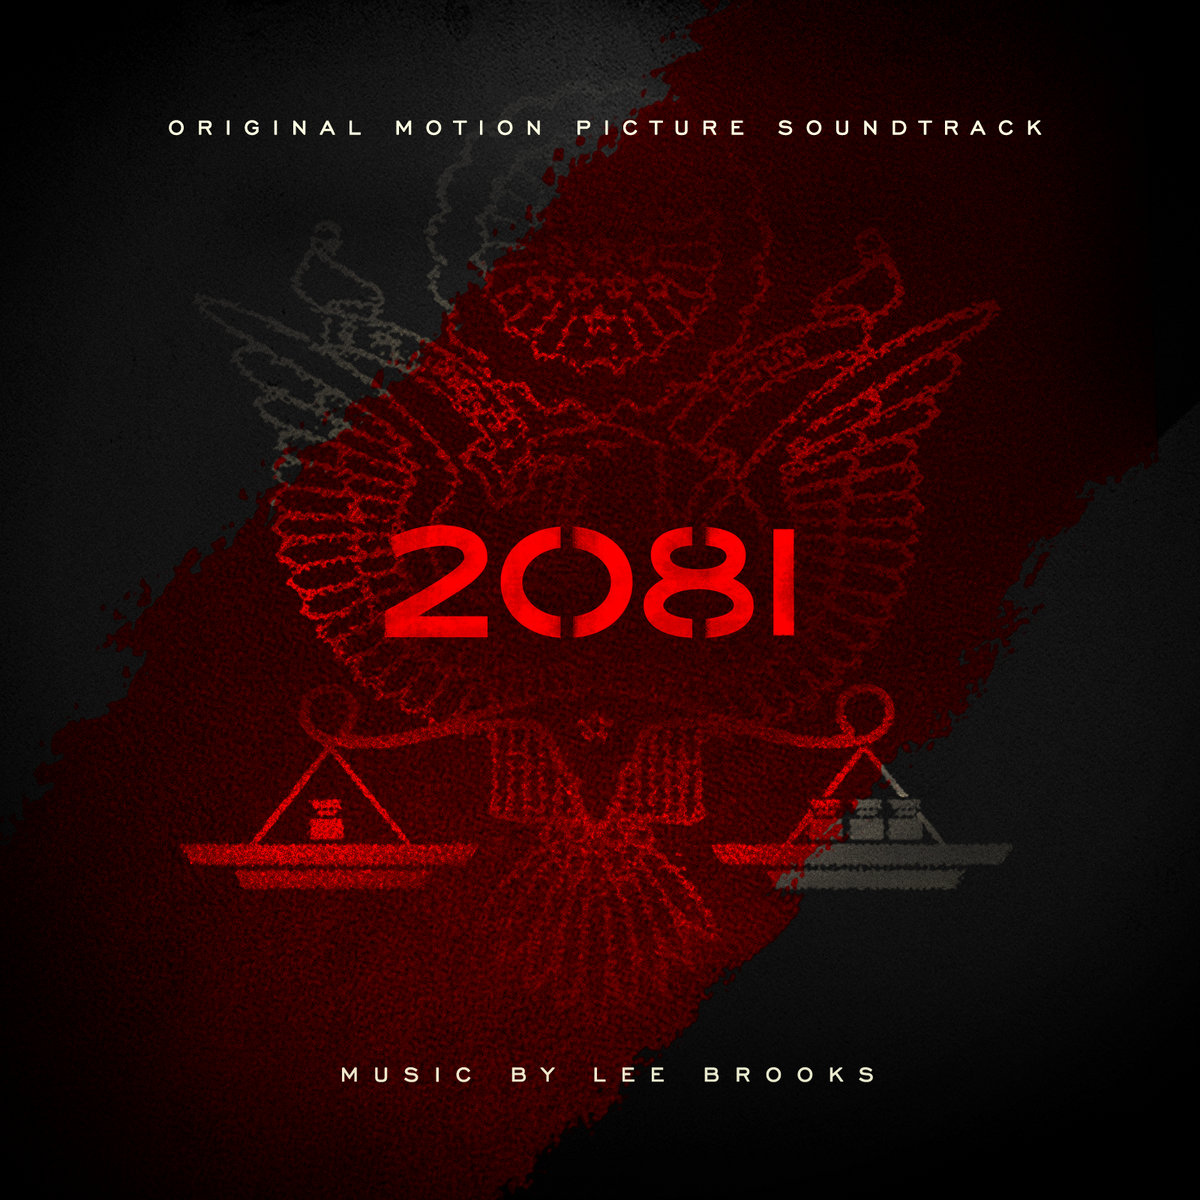 2081. by Lee Brooks